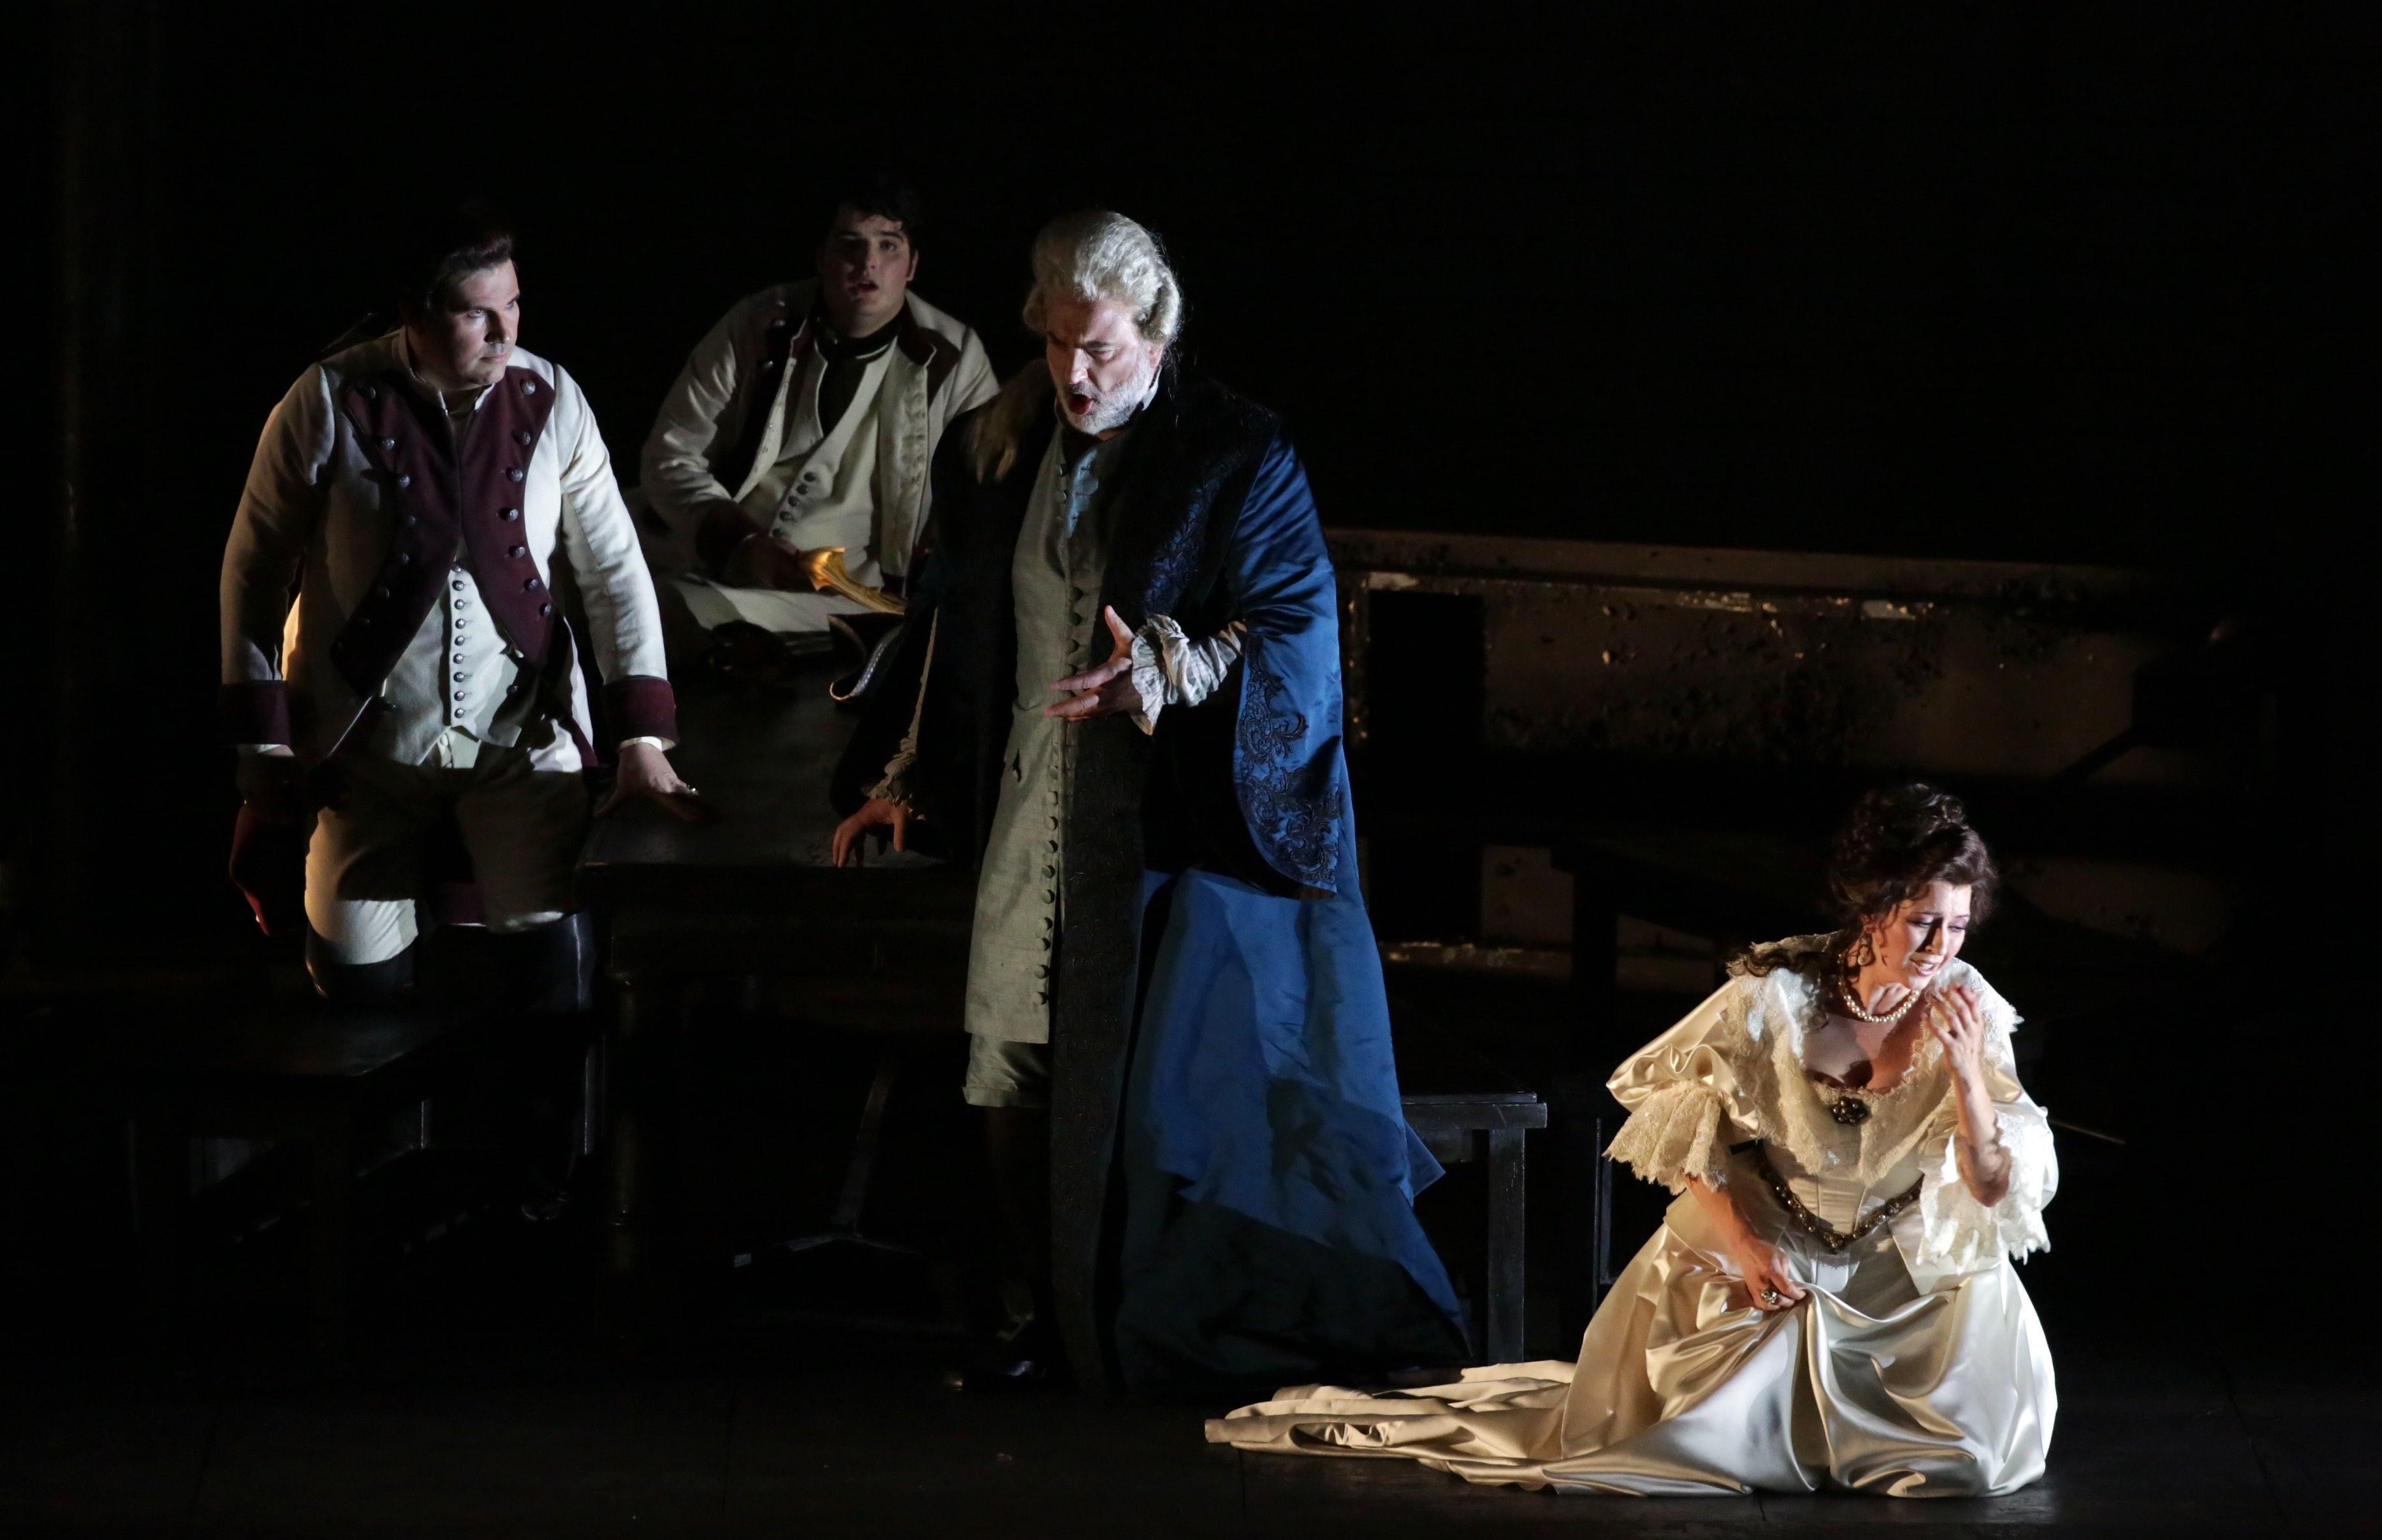 I Masnadieri; Giuseppe Verdi; Michele Mariotti; David McVicar; Opera; Lirica; Teatro alla Scala; Lisette Oropesa; Michele Pertusi